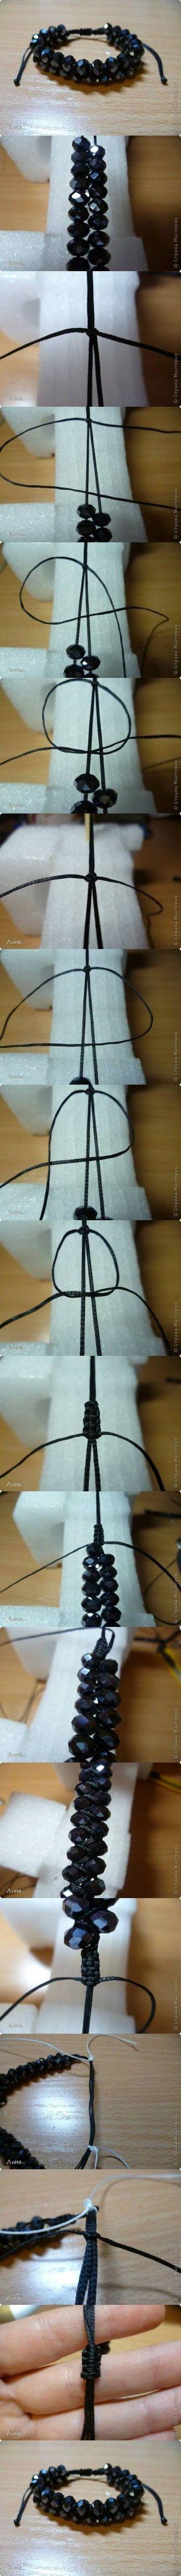 DIY Dual Shambhala Bracelet DIY Projects